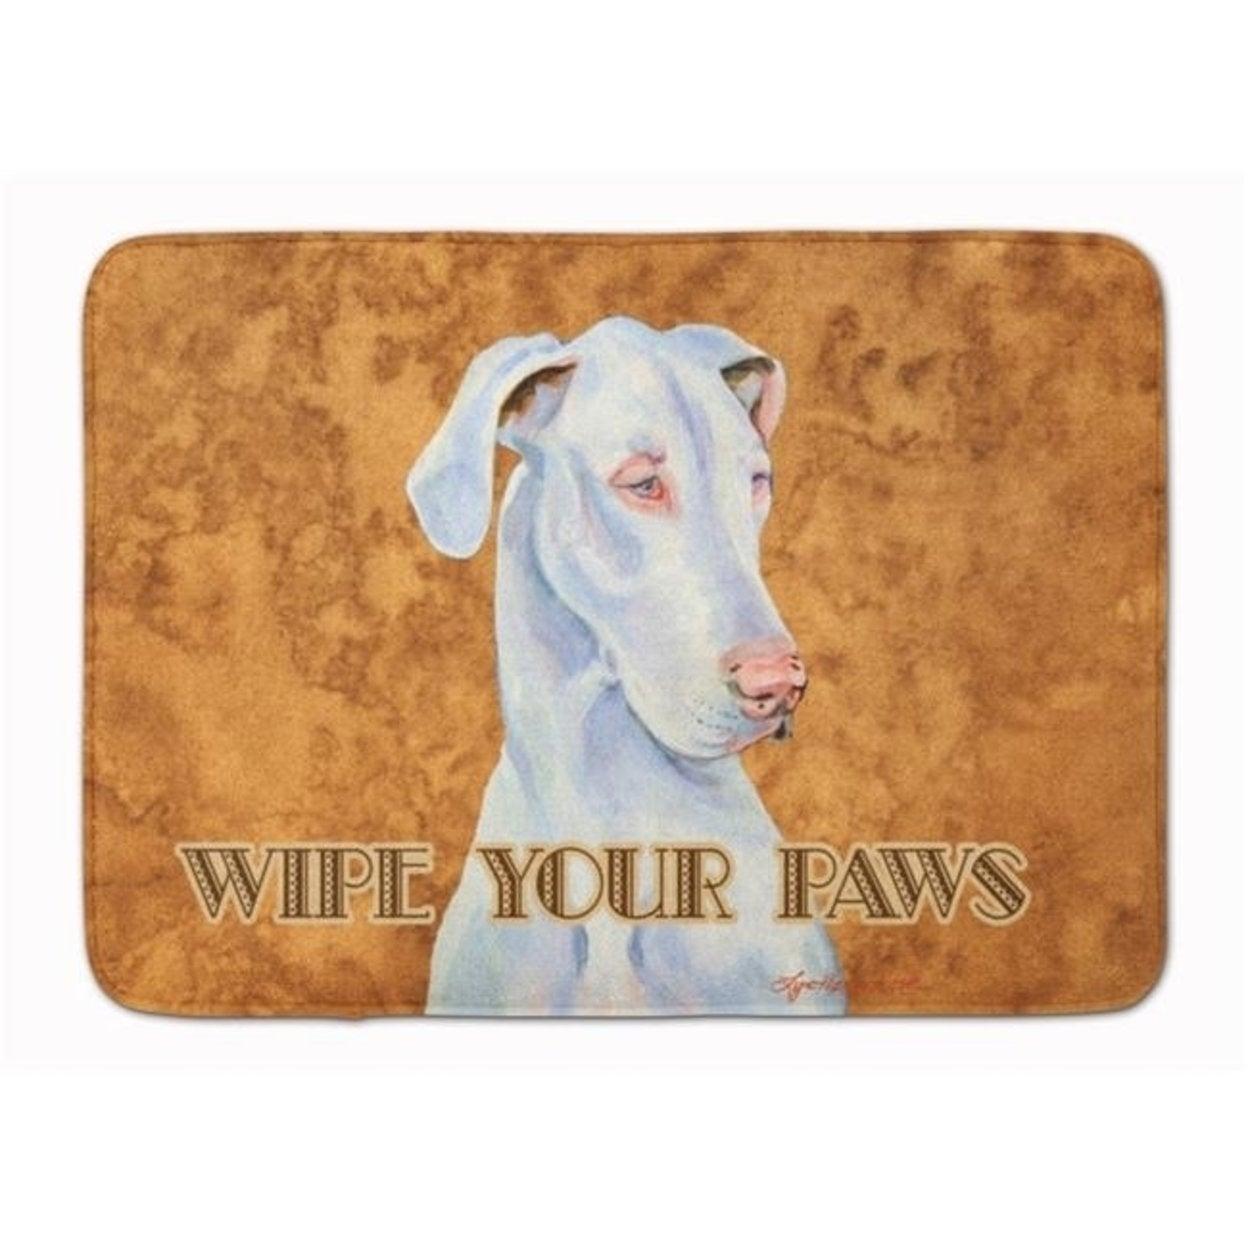 Carolines Treasures Lh9444rug White Great Dane Wipe Your Paws Machine Washable Memory Foam Mat Overstock 27713881